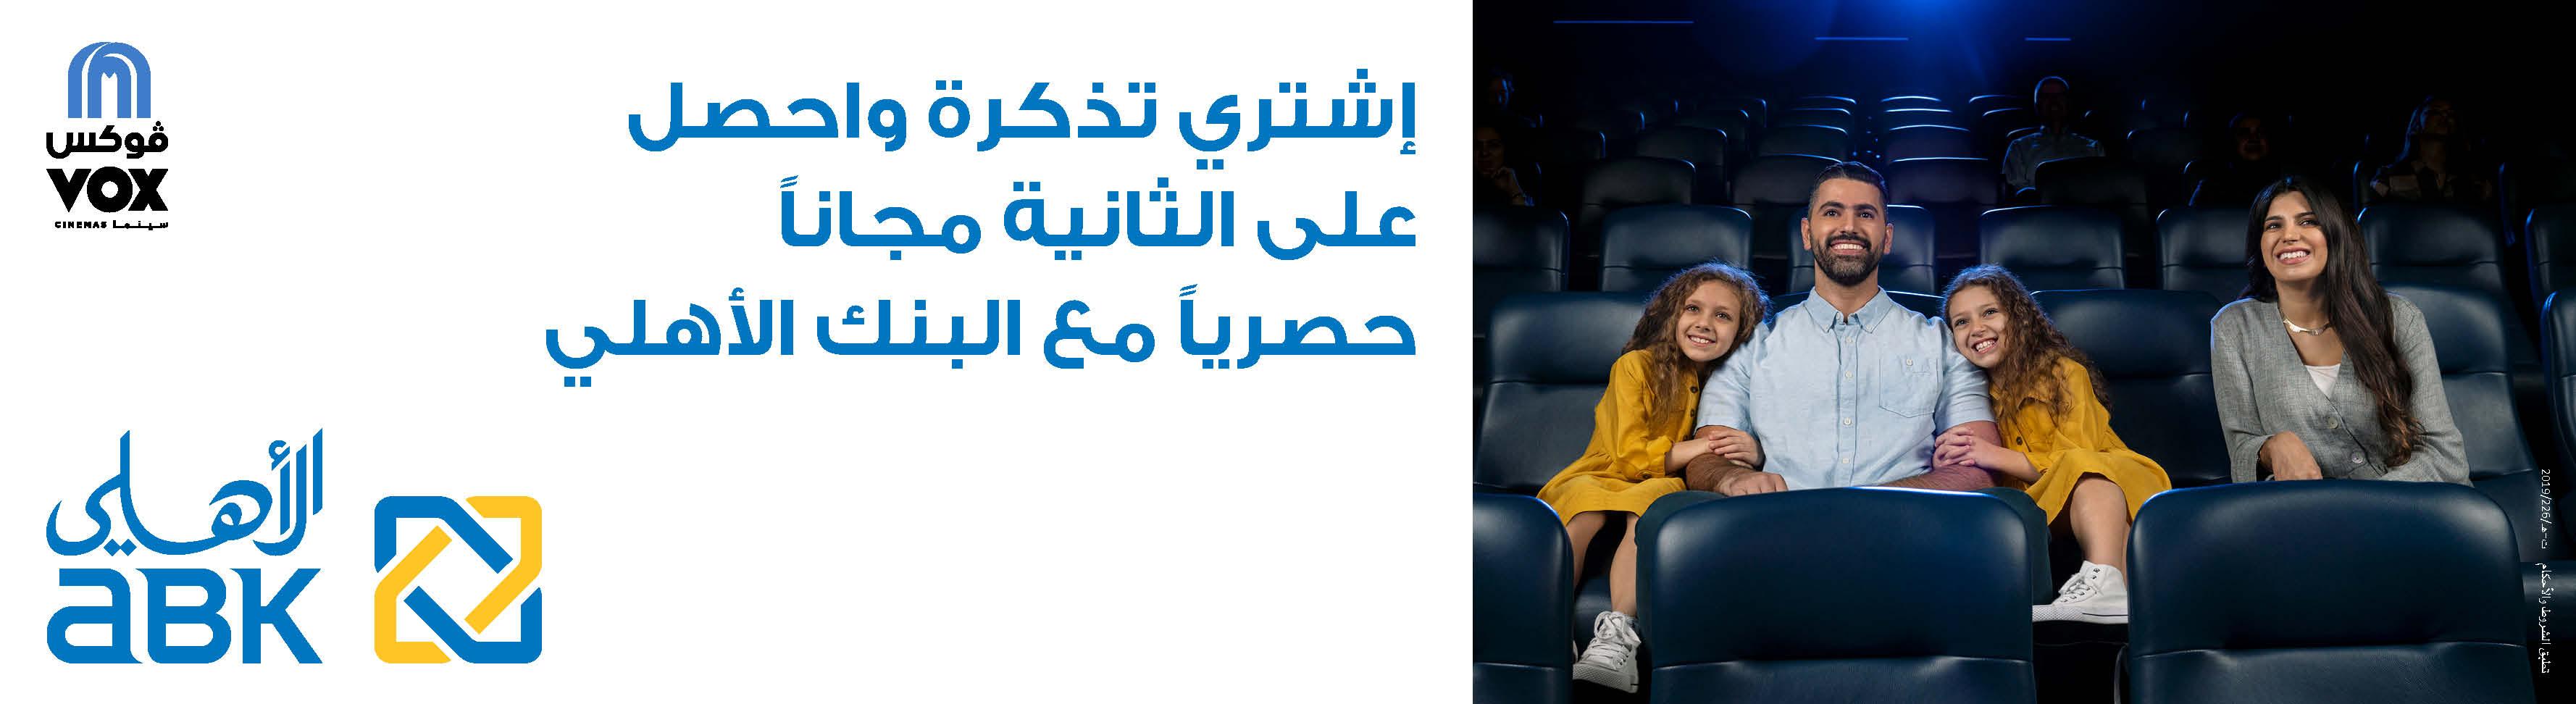 Al Ahli Bank offer